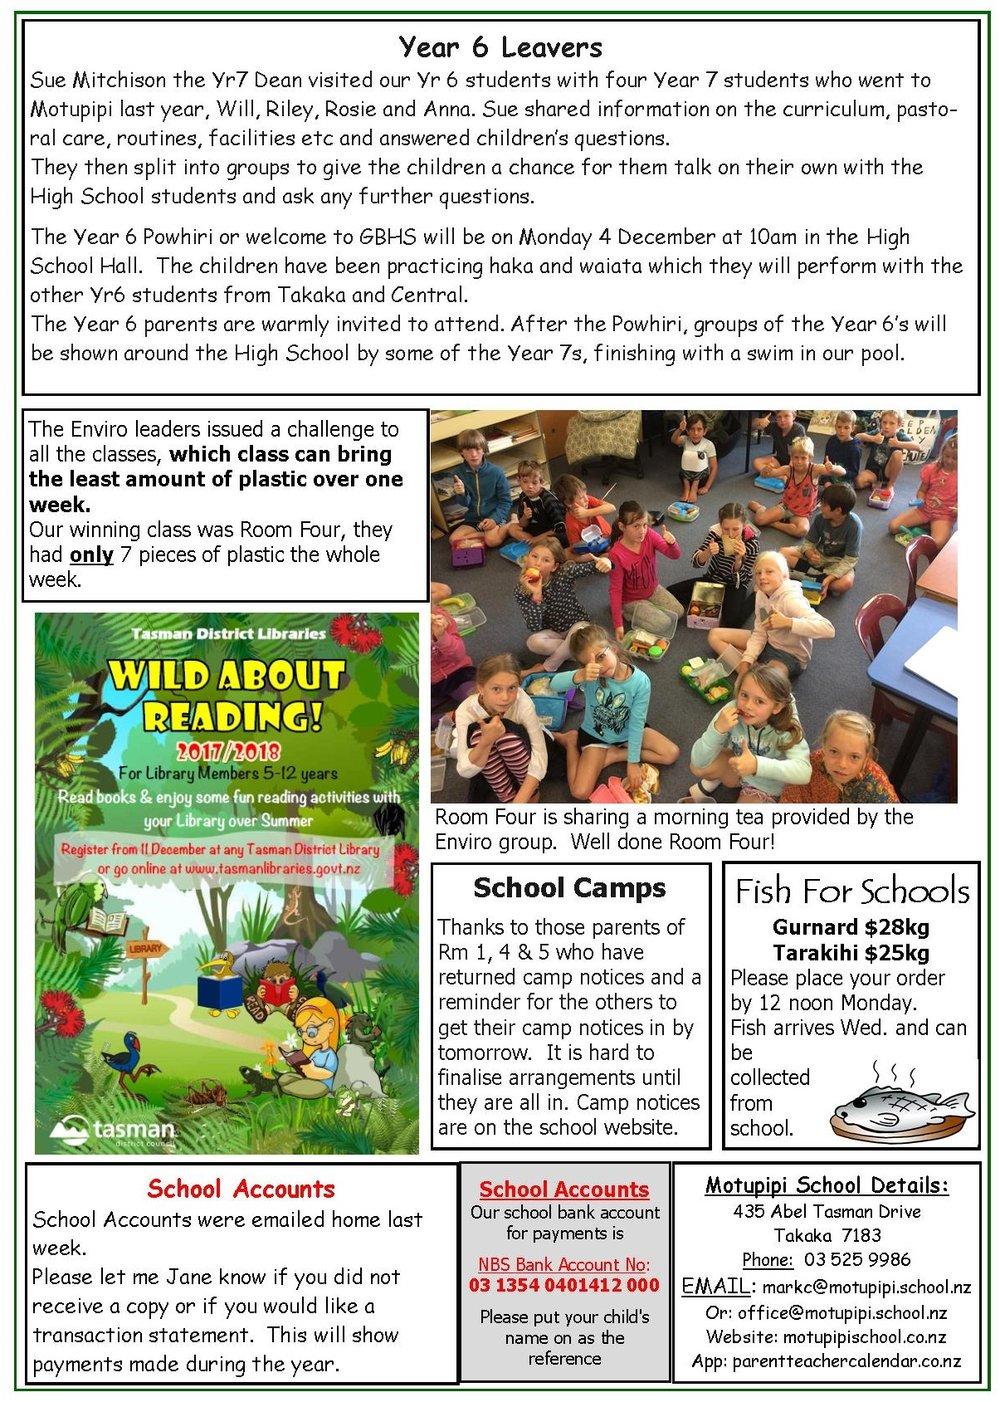 23rd November 2017 Page 2.jpg